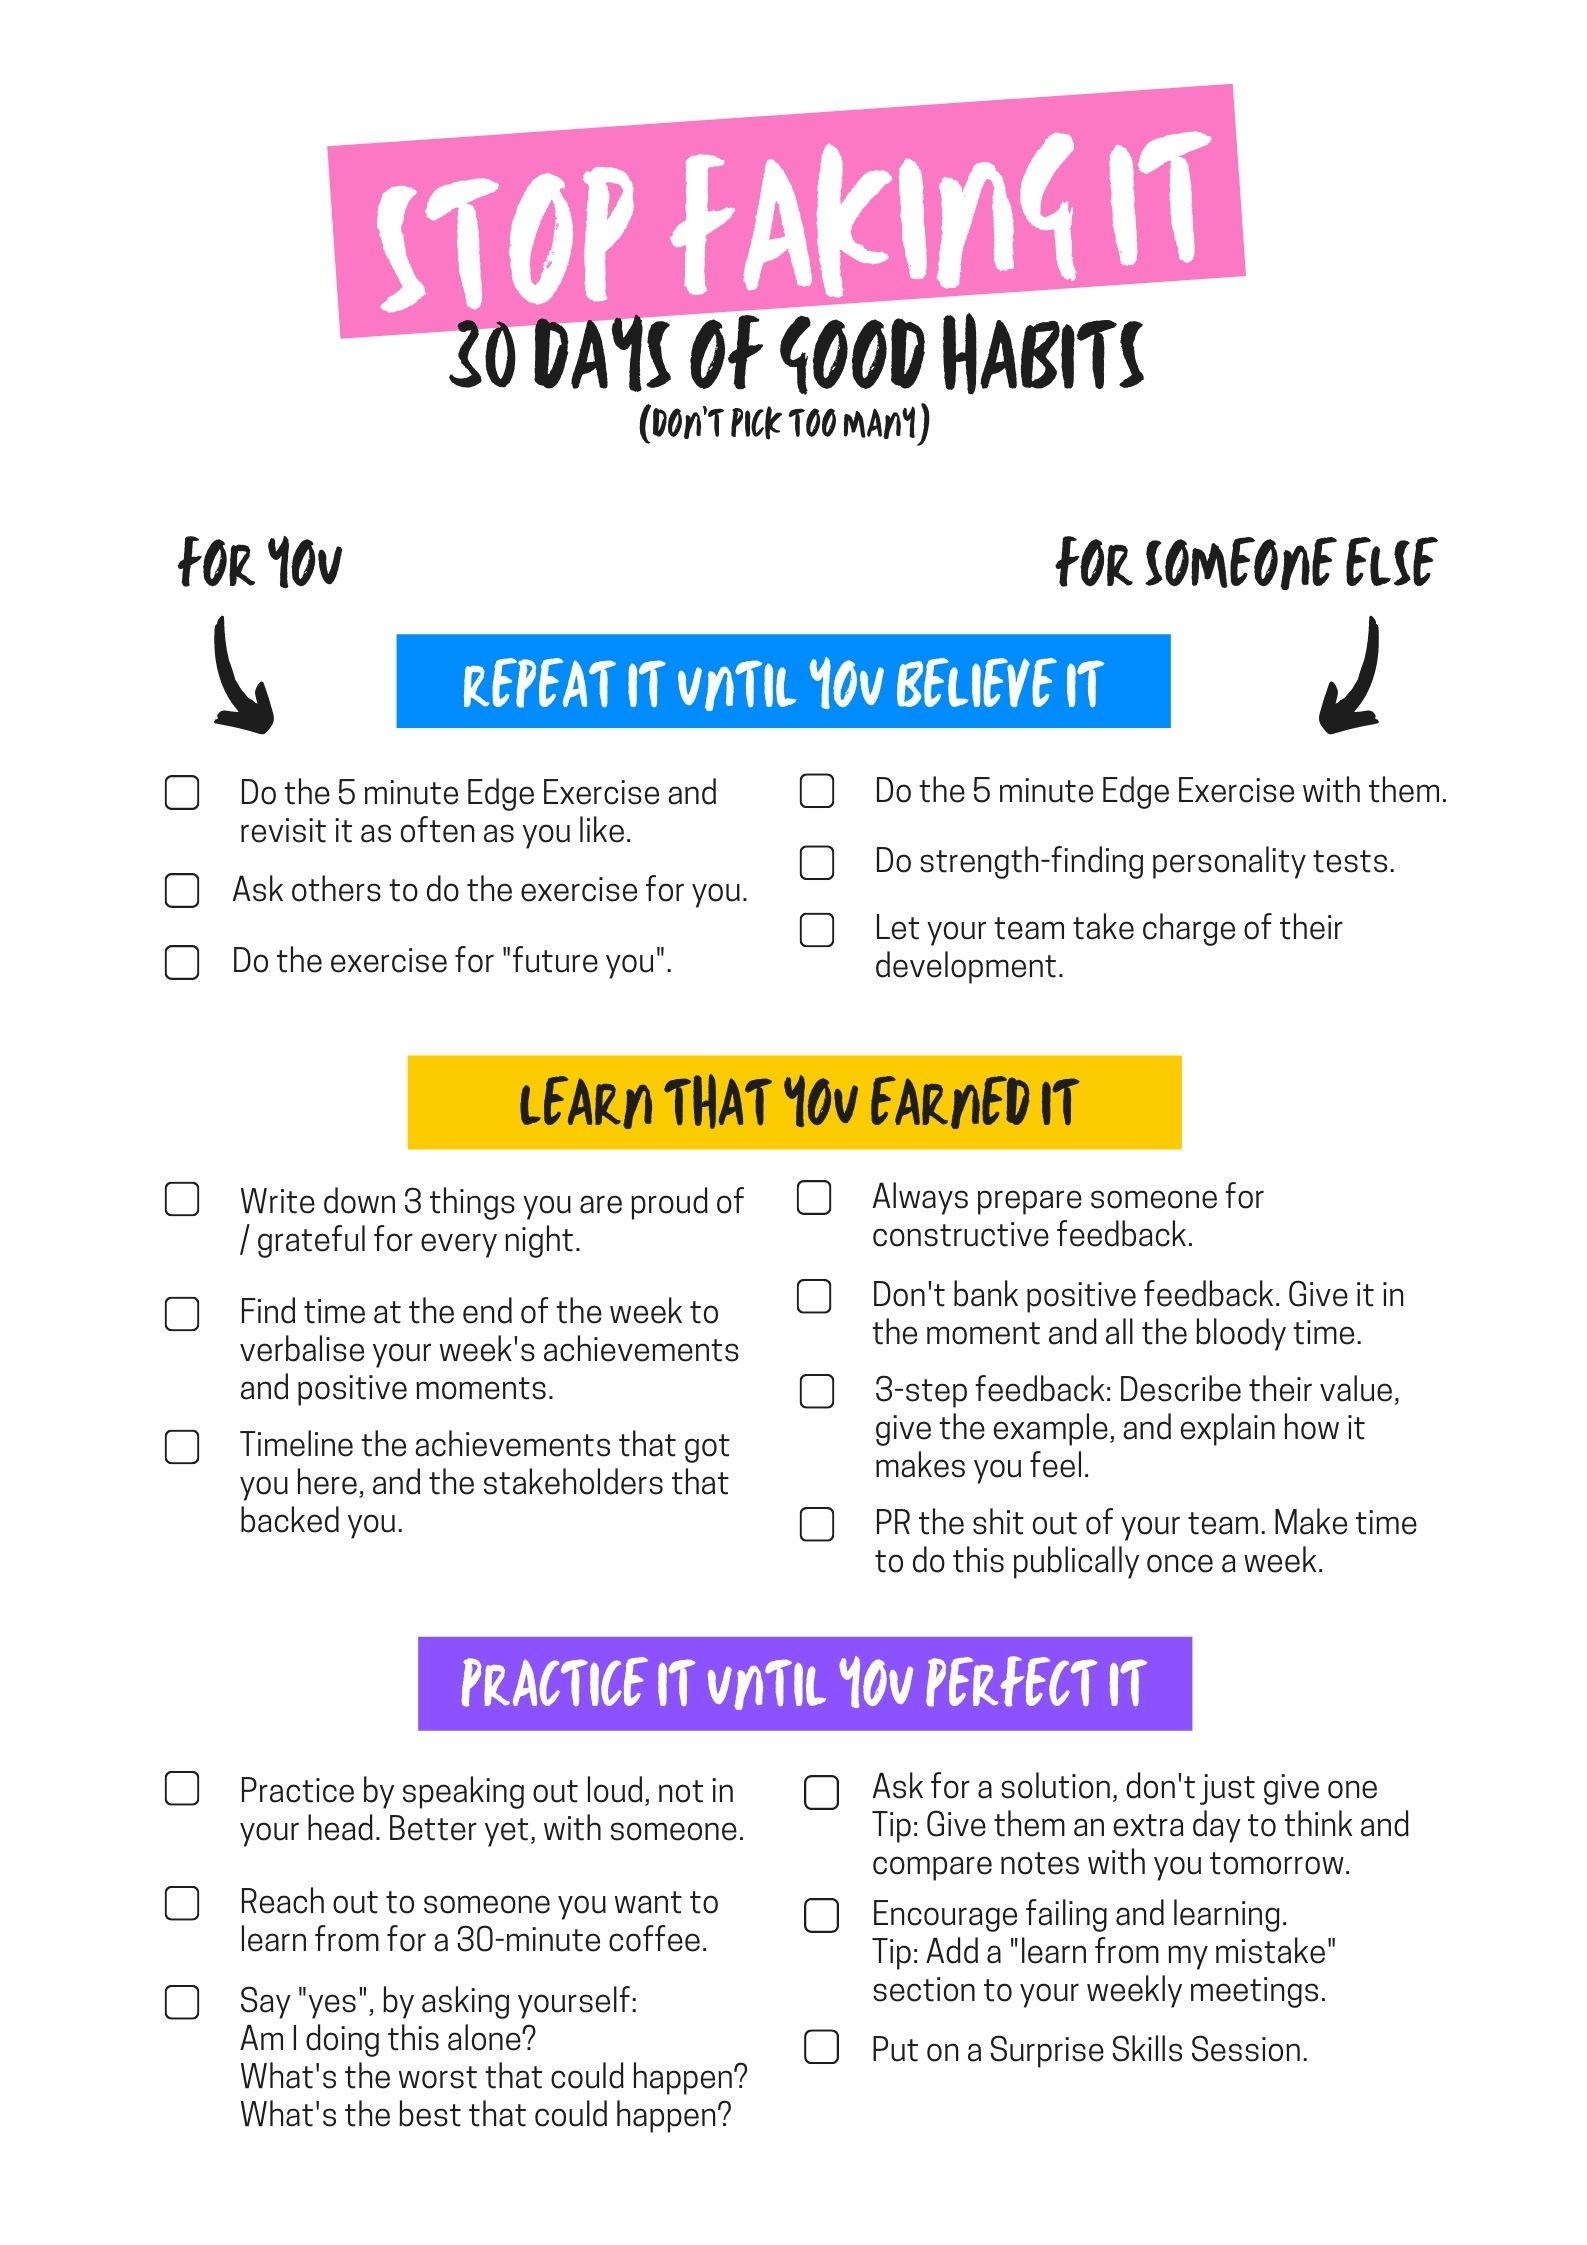 30 Days of Good Habits Challenge